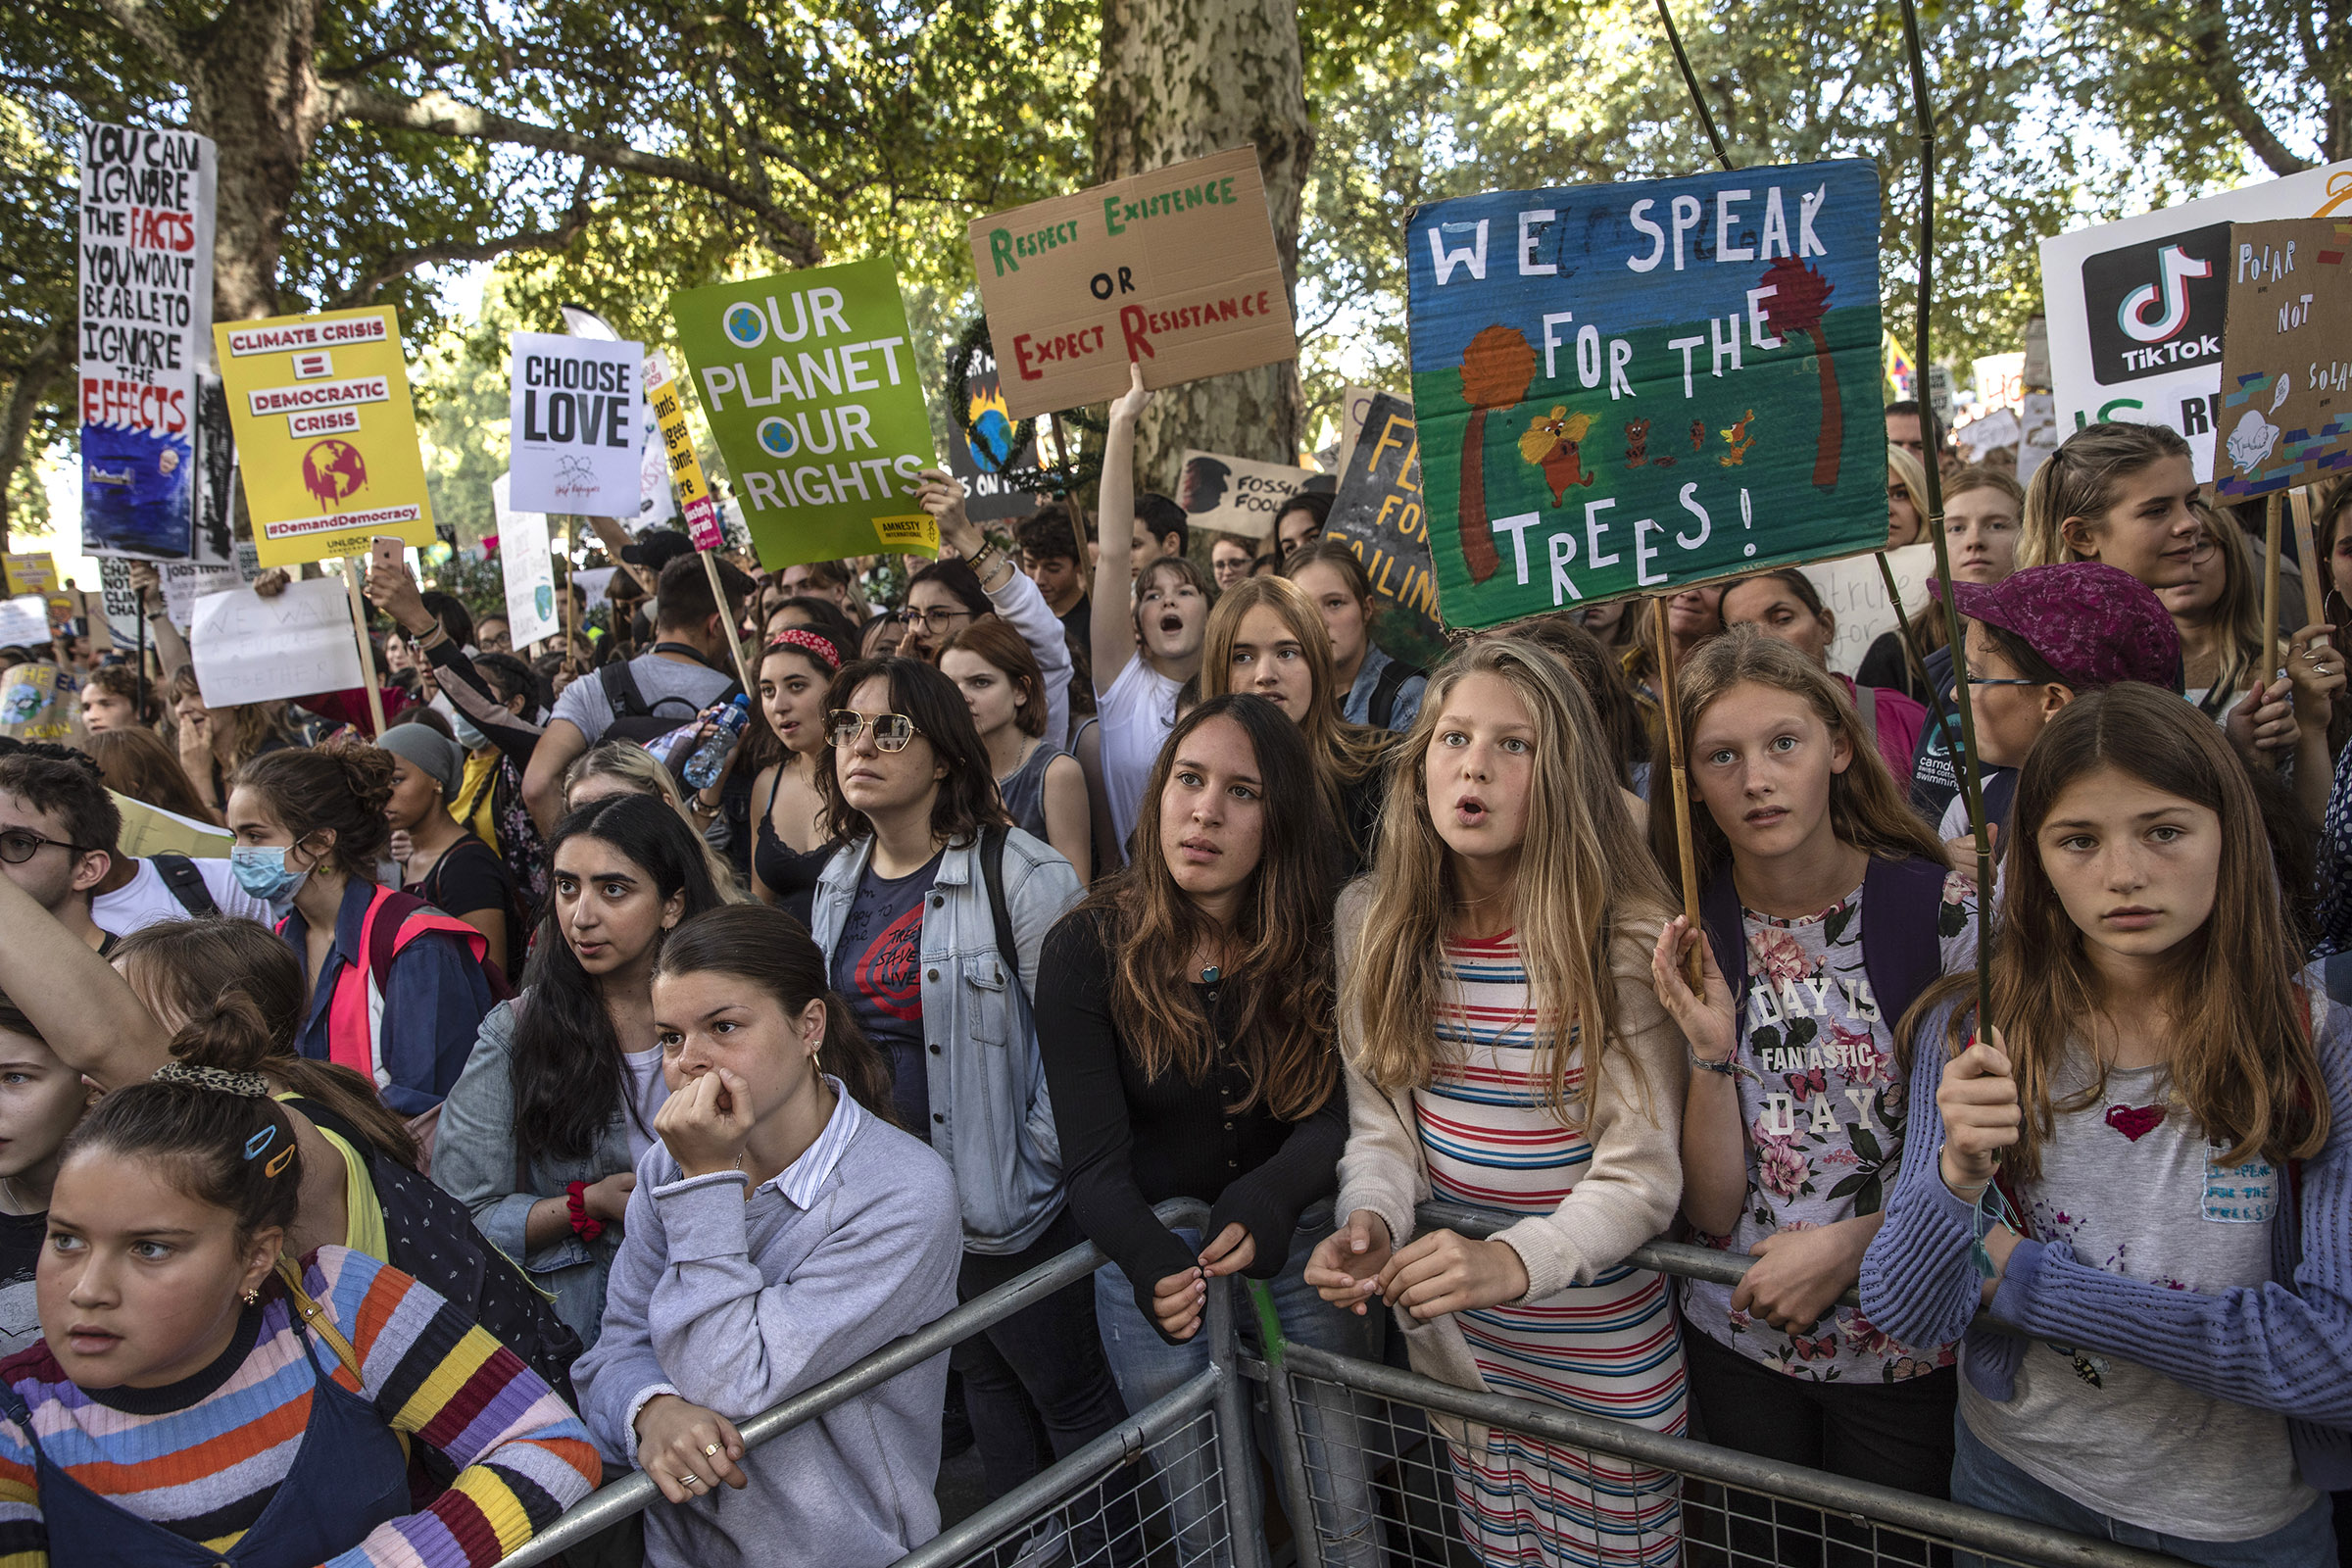 Global Climate Strike: Greta Thunberg, Students Lead Protest   Time